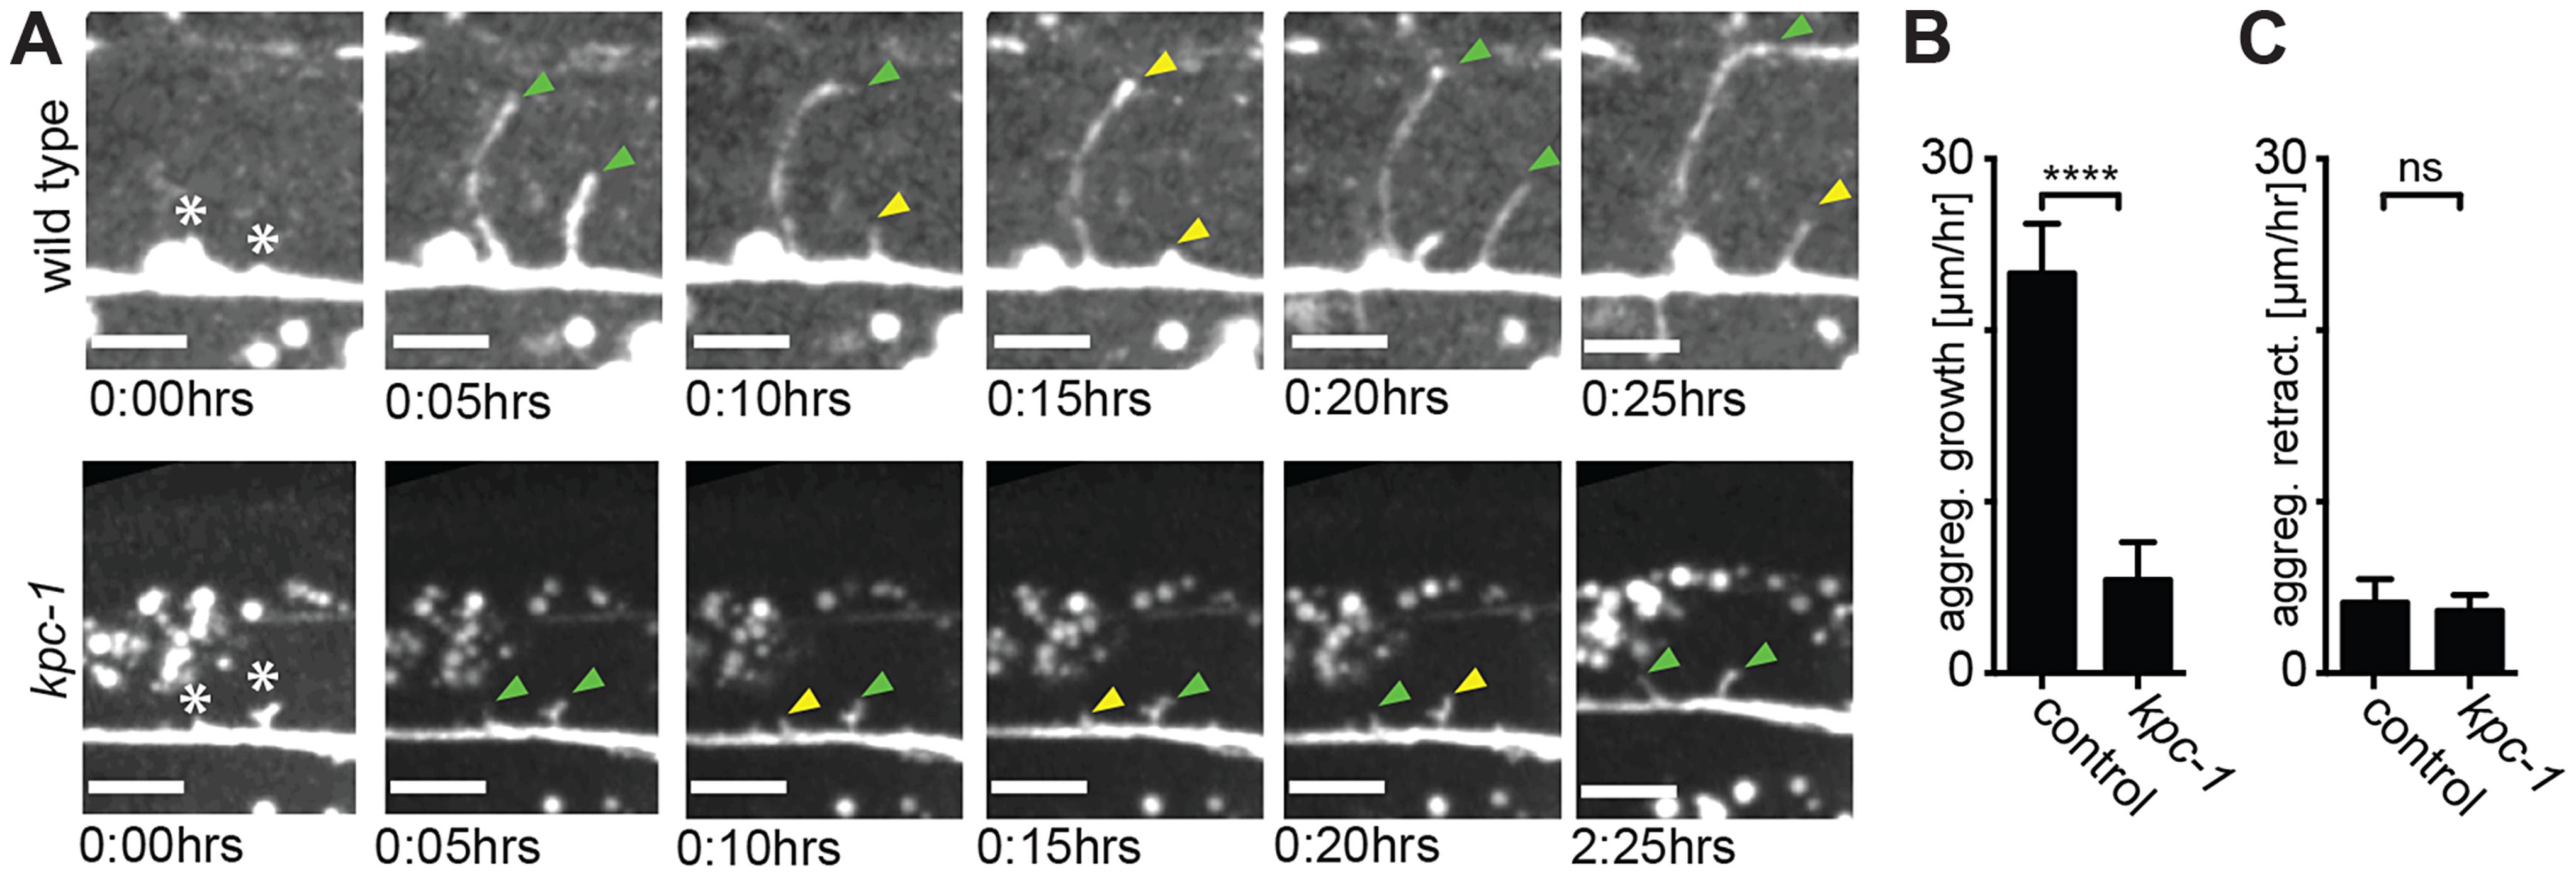 Dendrites in <i>kpc-1</i> display decreased speed of growth.